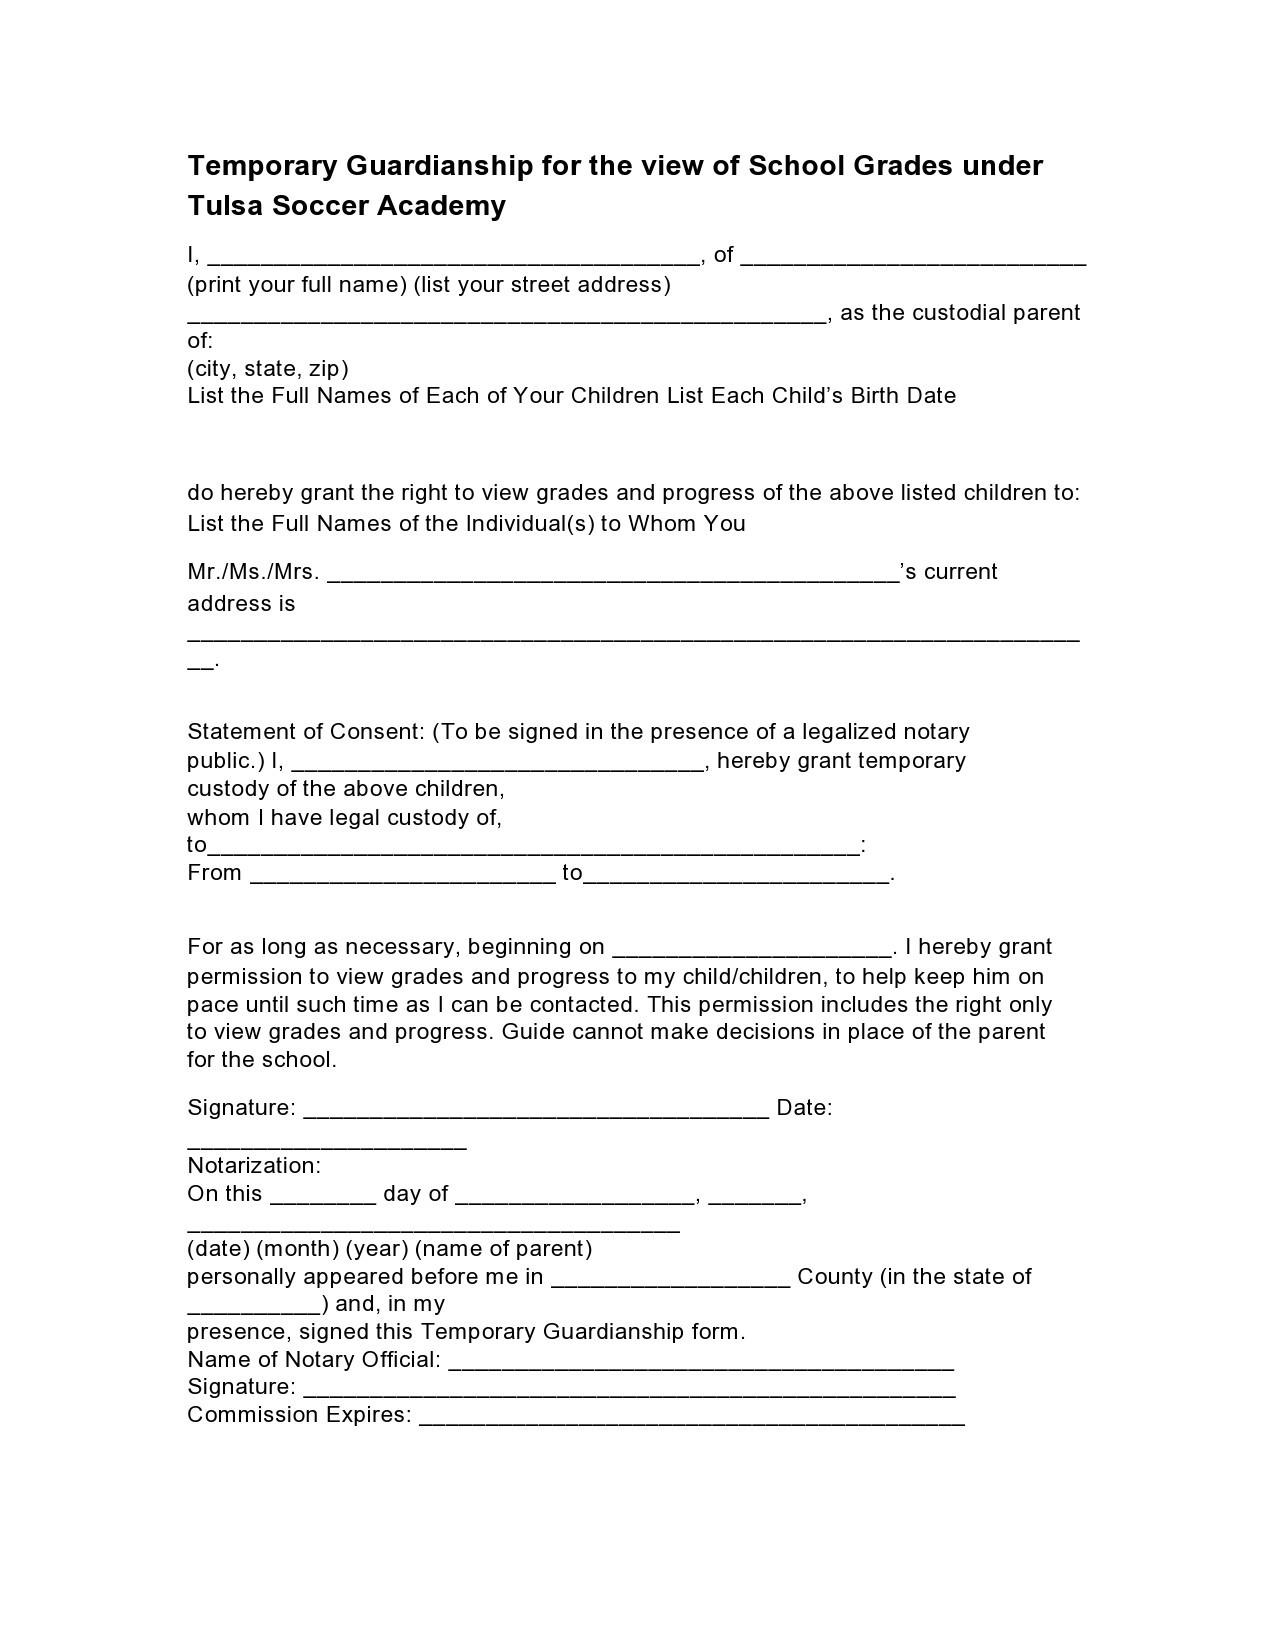 Free guardianship form 20